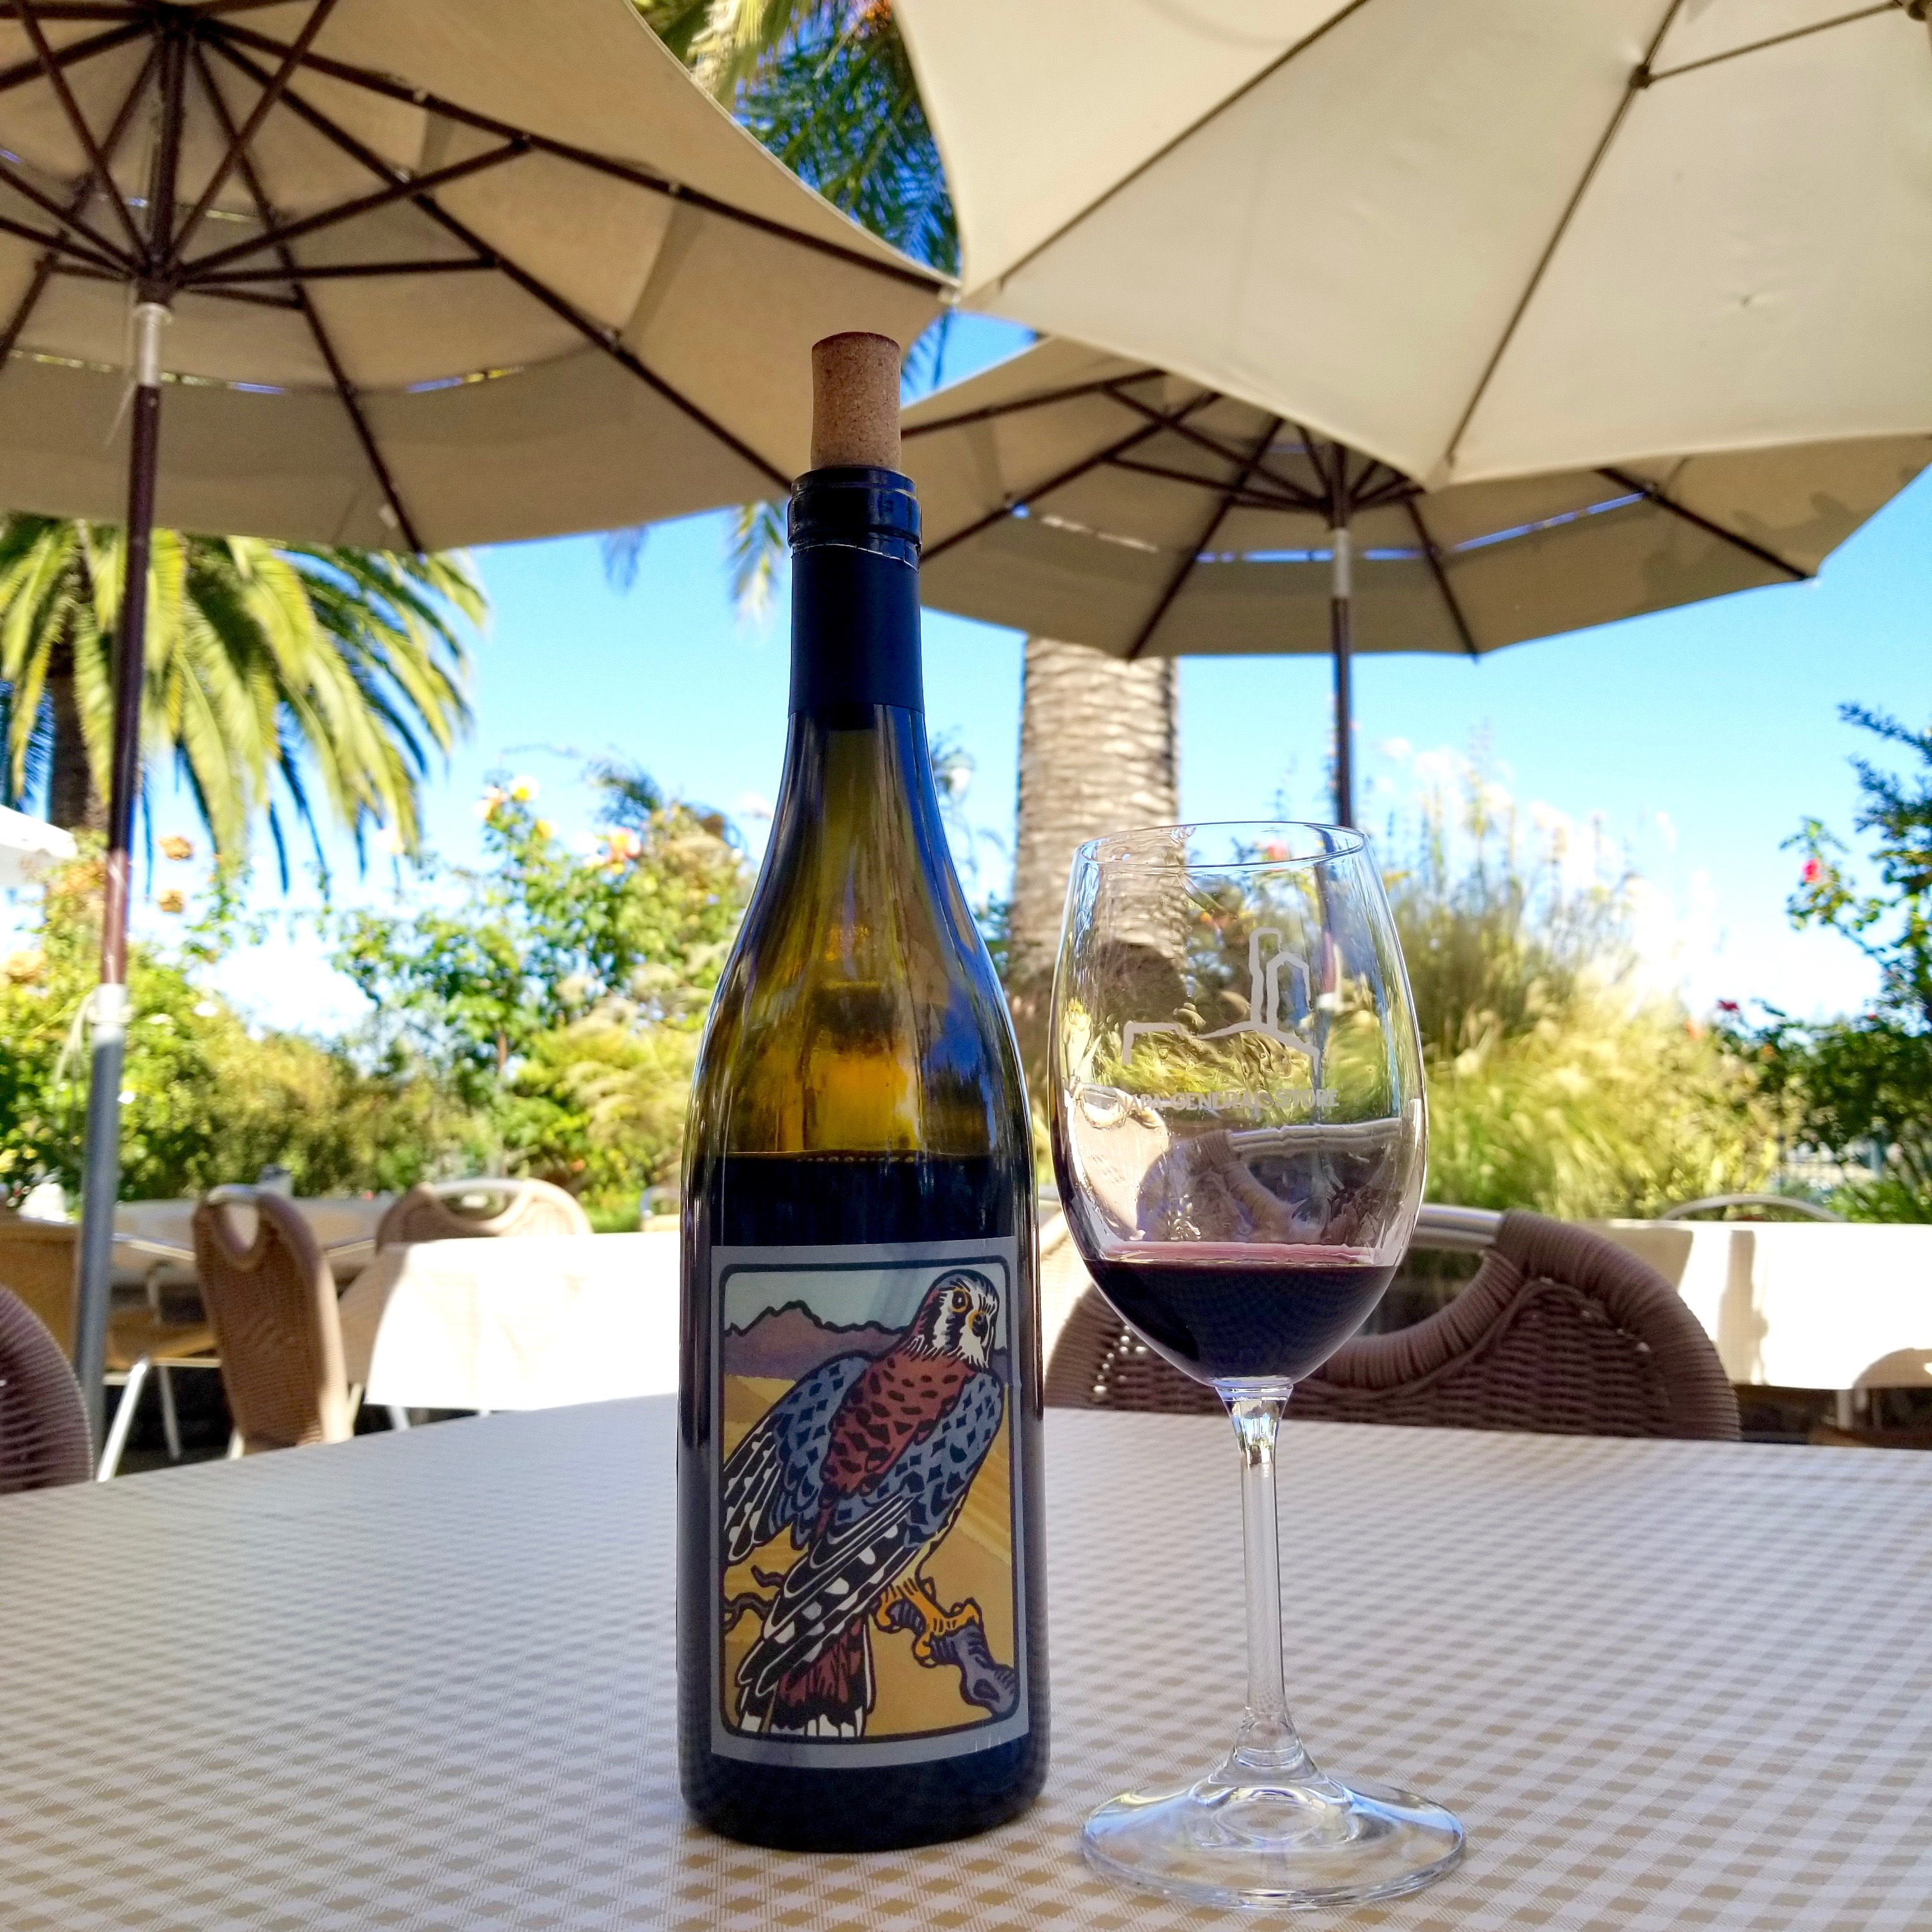 Wildlife Wine at Napa California General Store